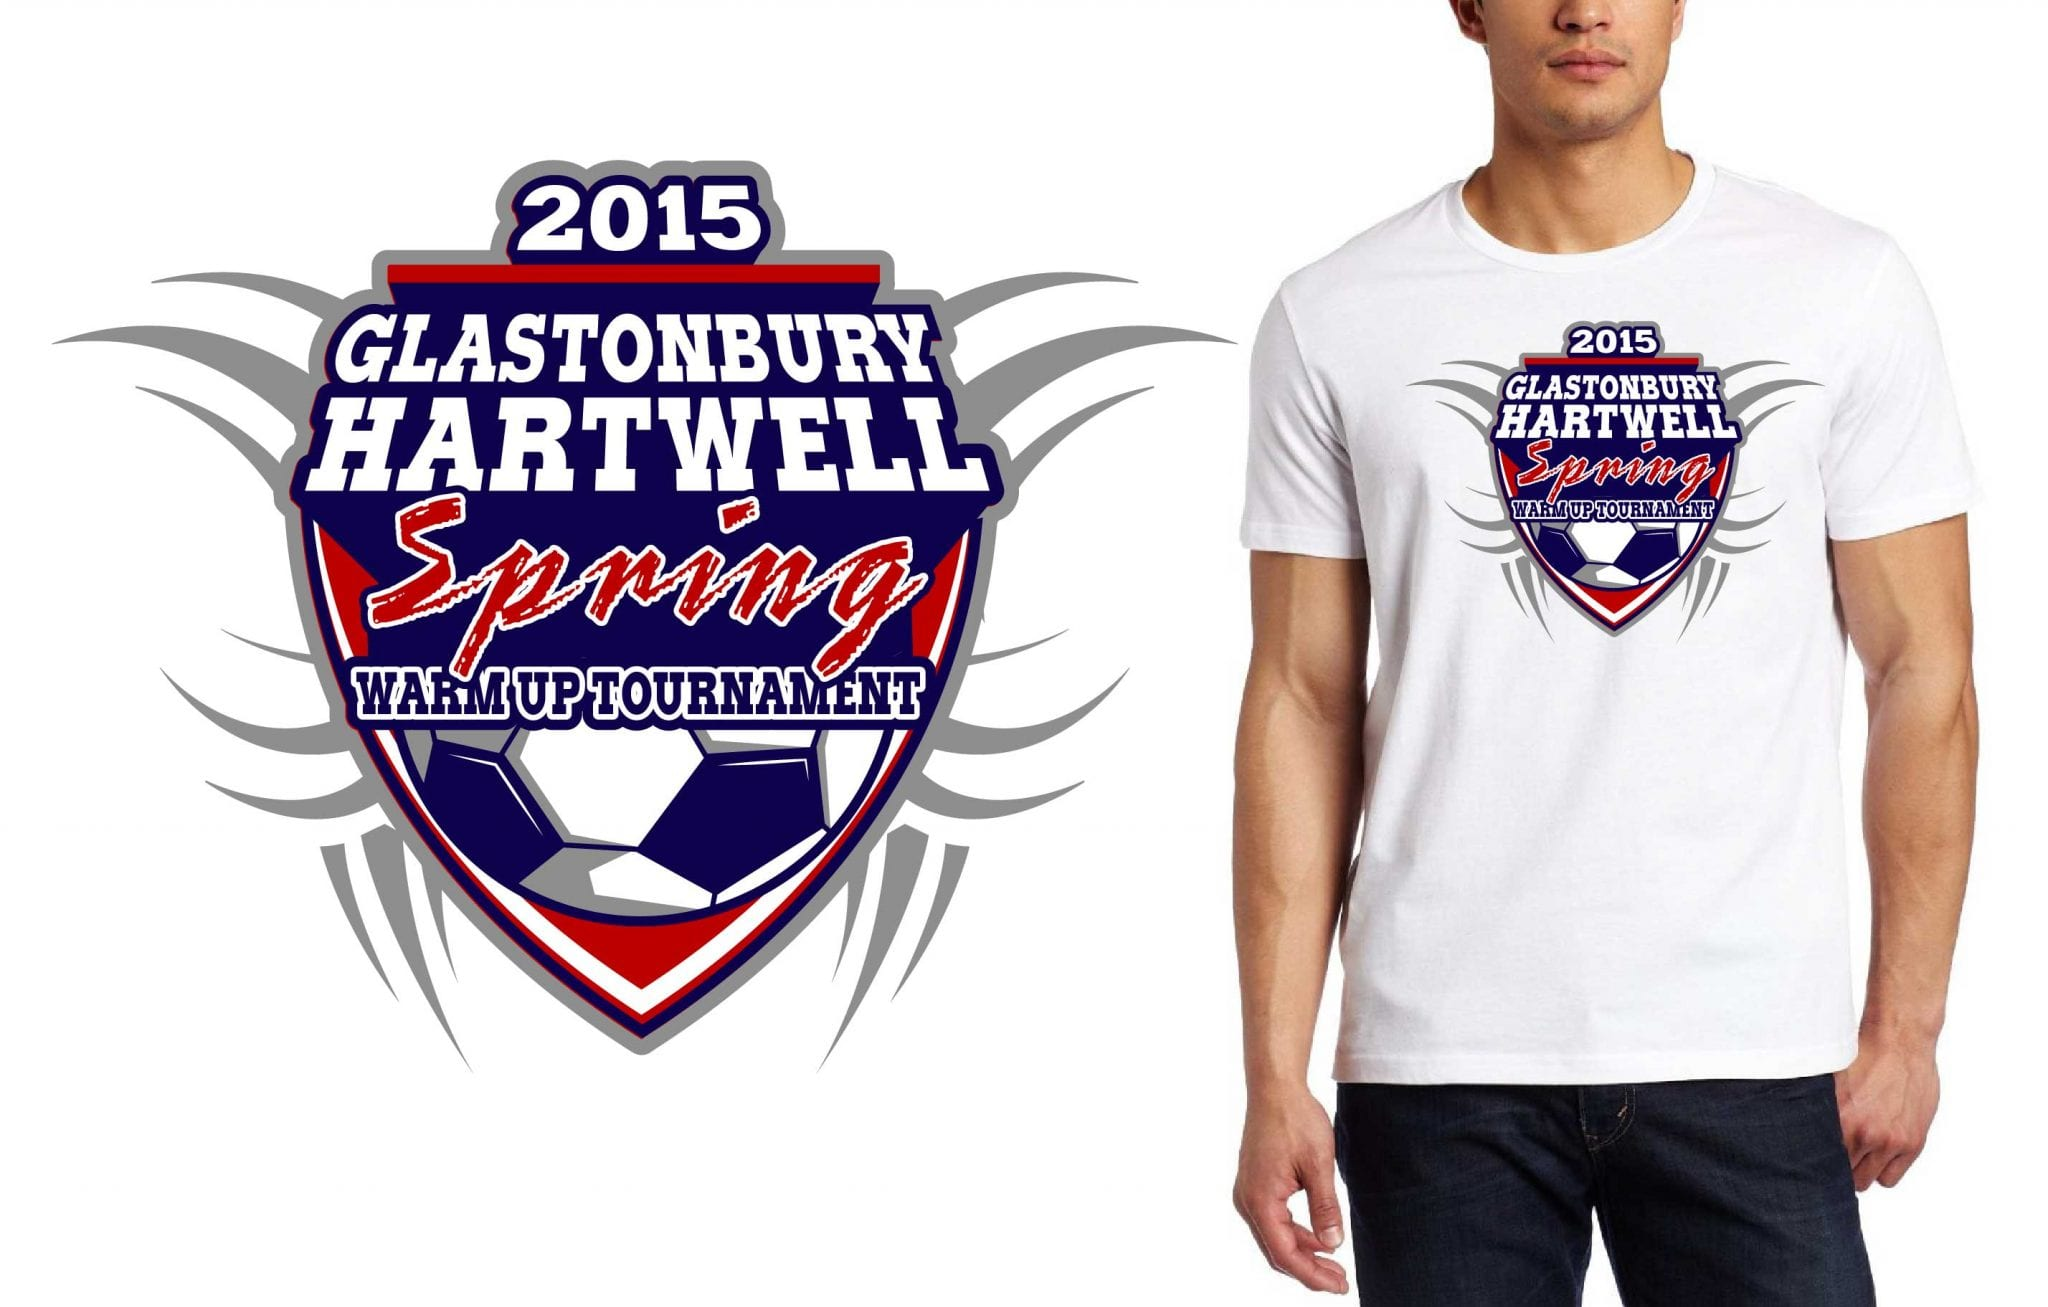 2015 Glastonbury Hartwell Spring Warm-Up Tournament tshirt design